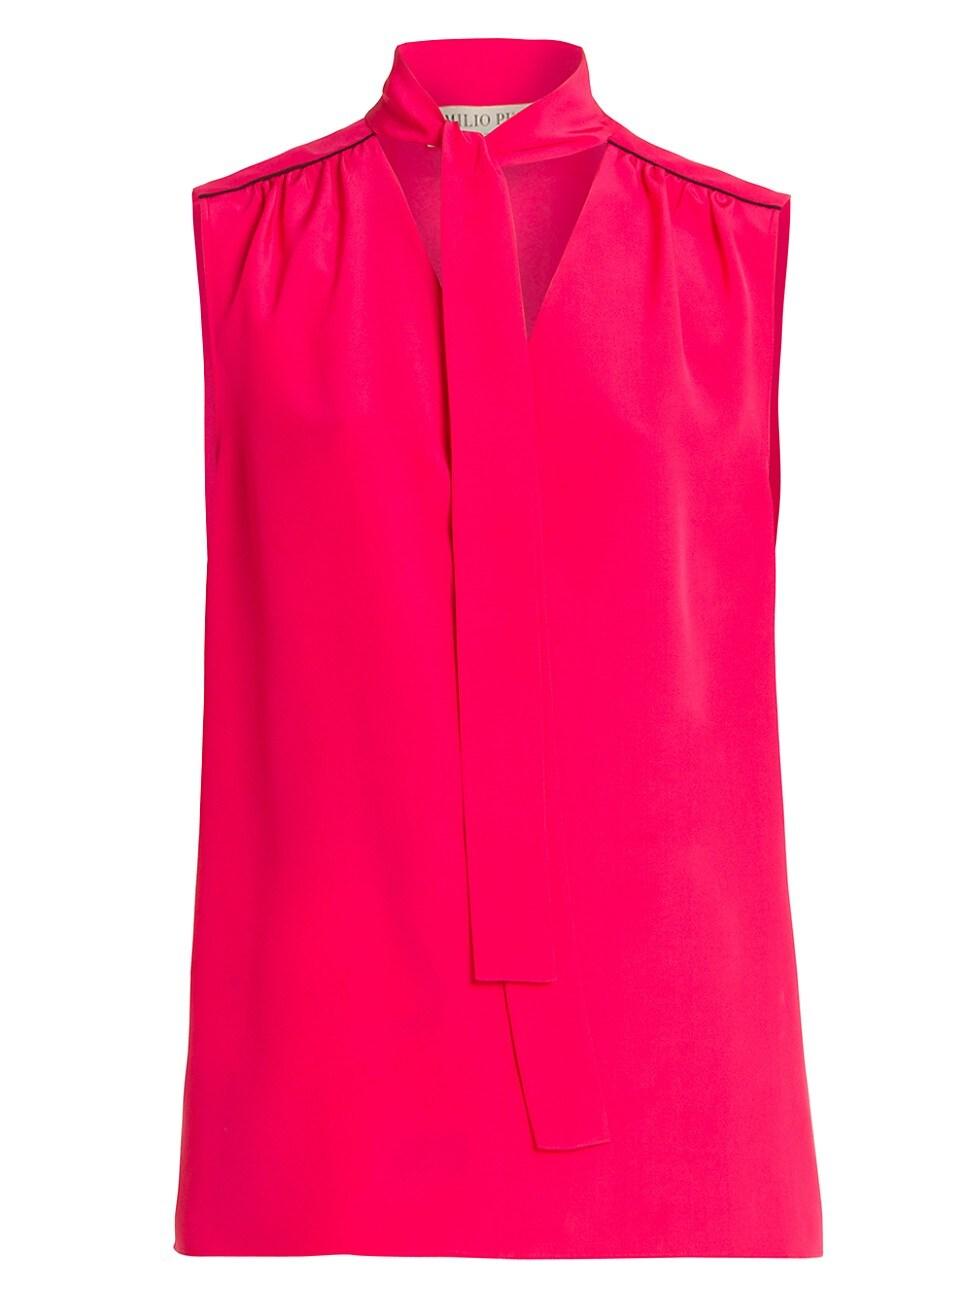 Emilio Pucci WOMEN'S TIE-NECK SILK CREPE DE CHINE BLOUSE